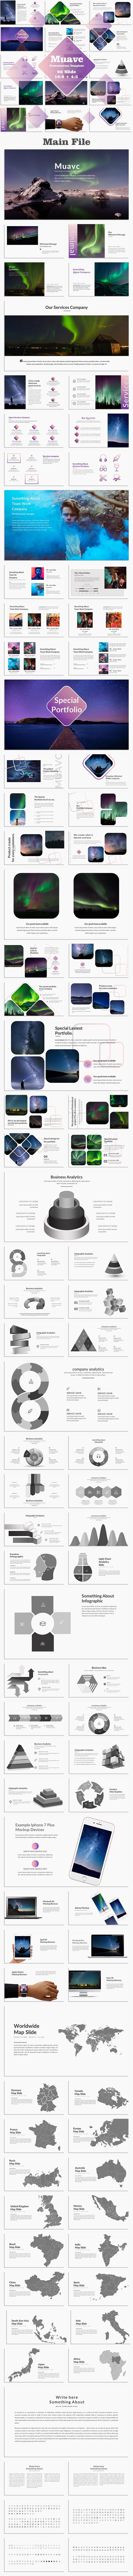 Muavc Minimal Google Slide Template - Google Slides Presentation Templates